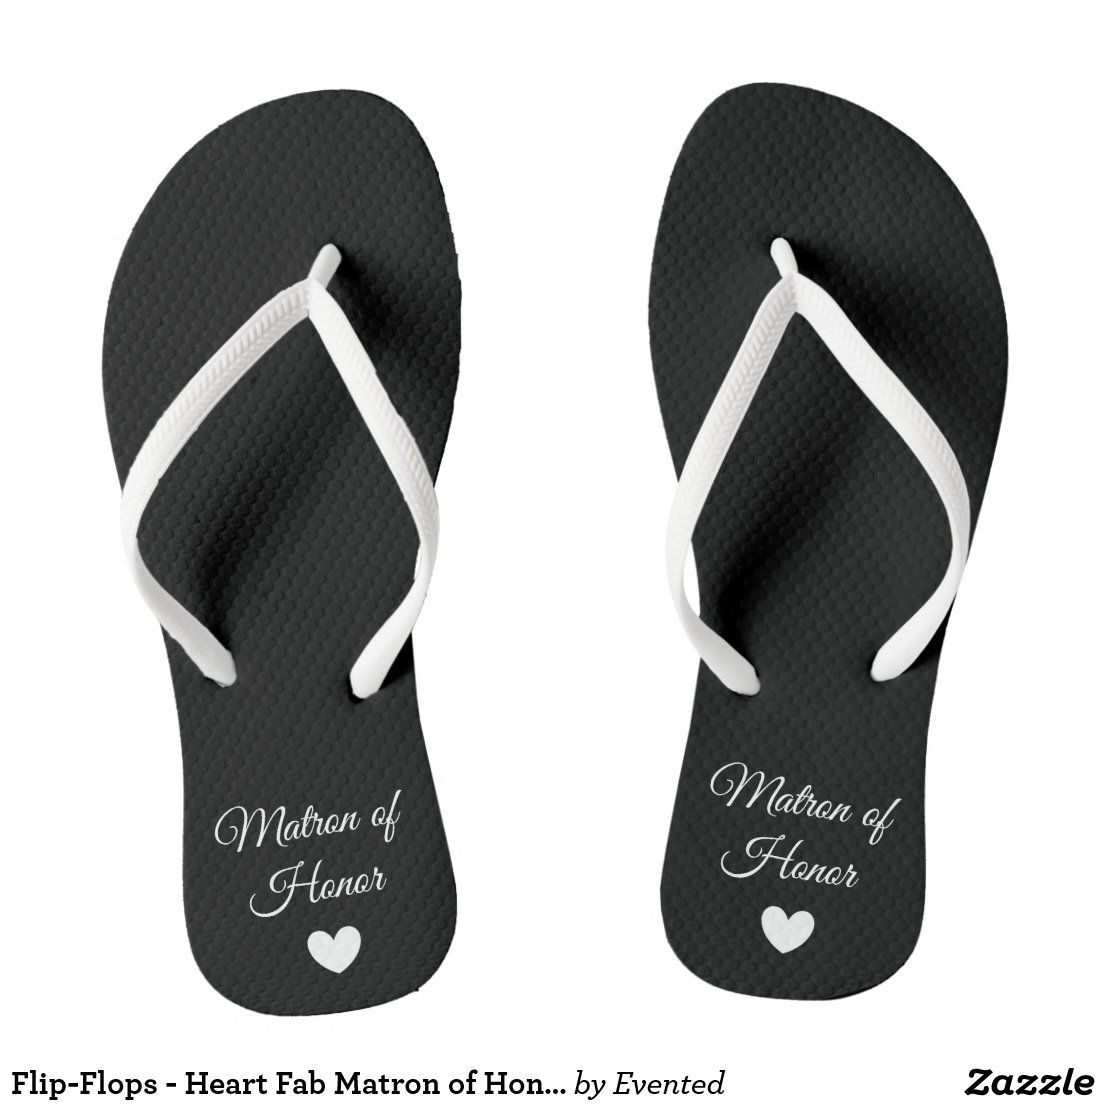 Flip Flops Heart Fab Matron Of Honor Flip Flops Zazzle Com In 2020 Flip Flop Shoes Bridesmaid Sandals Bridal Flip Flops